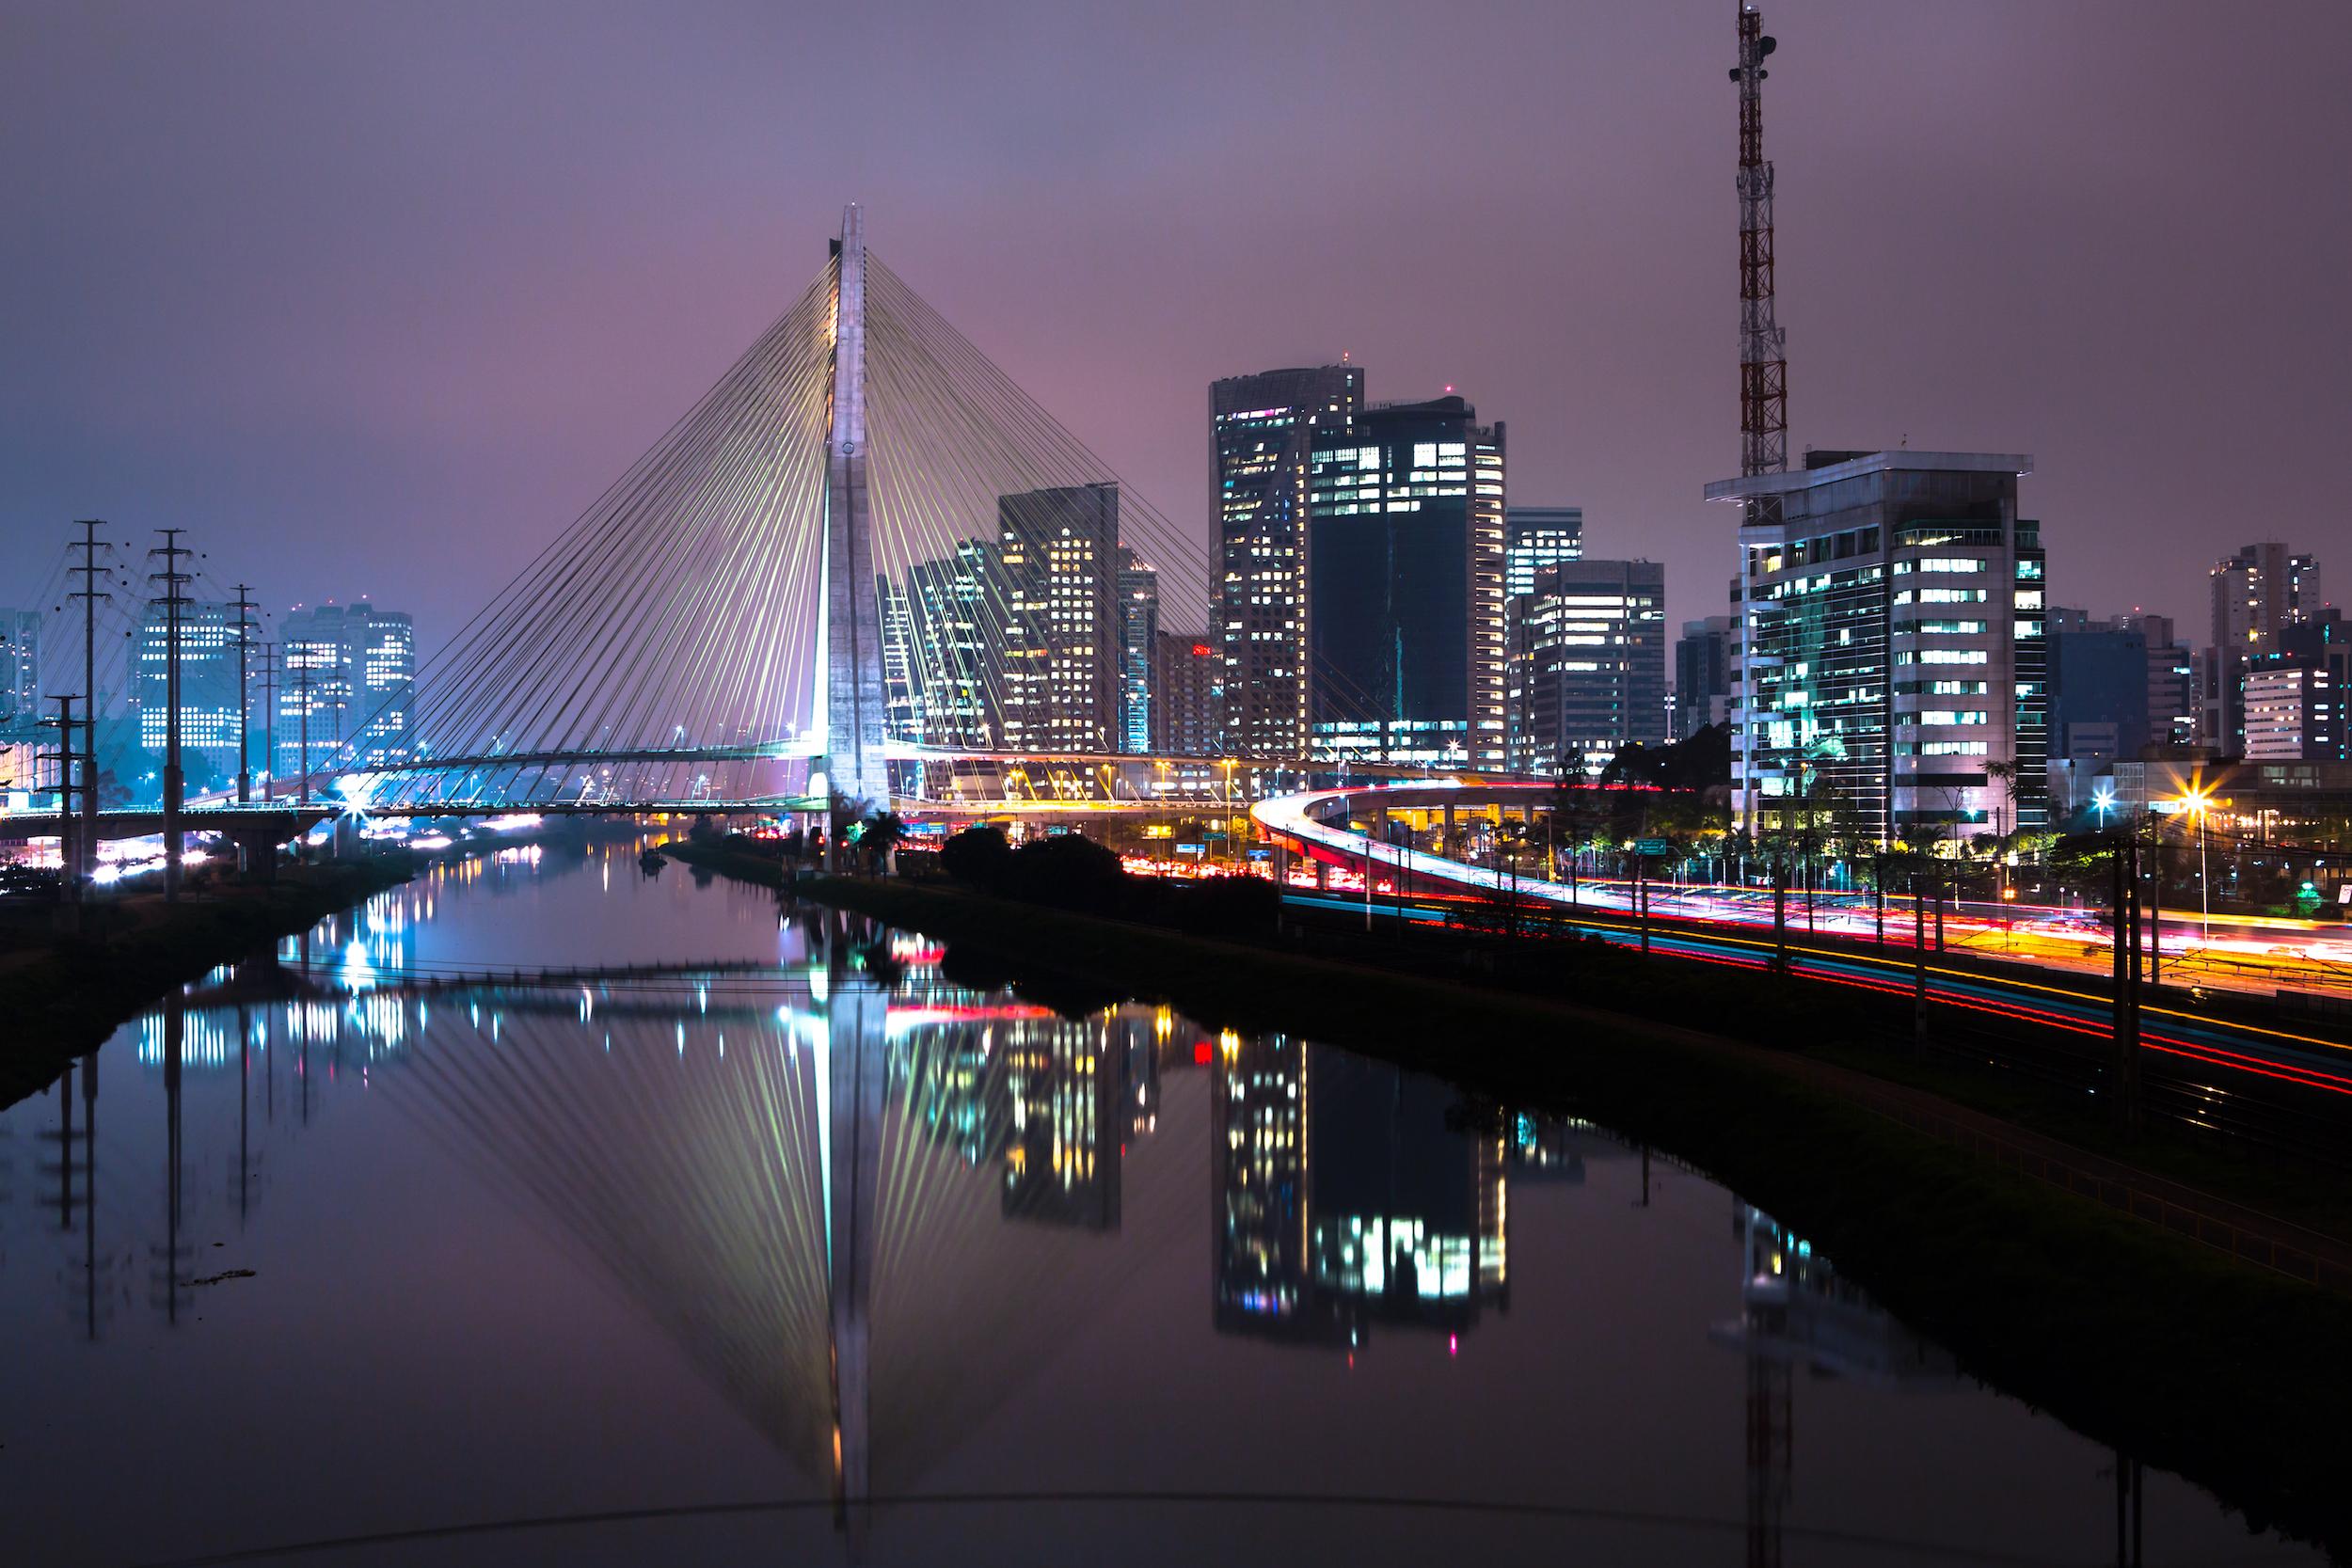 PVT Bresil - Sao Paulo